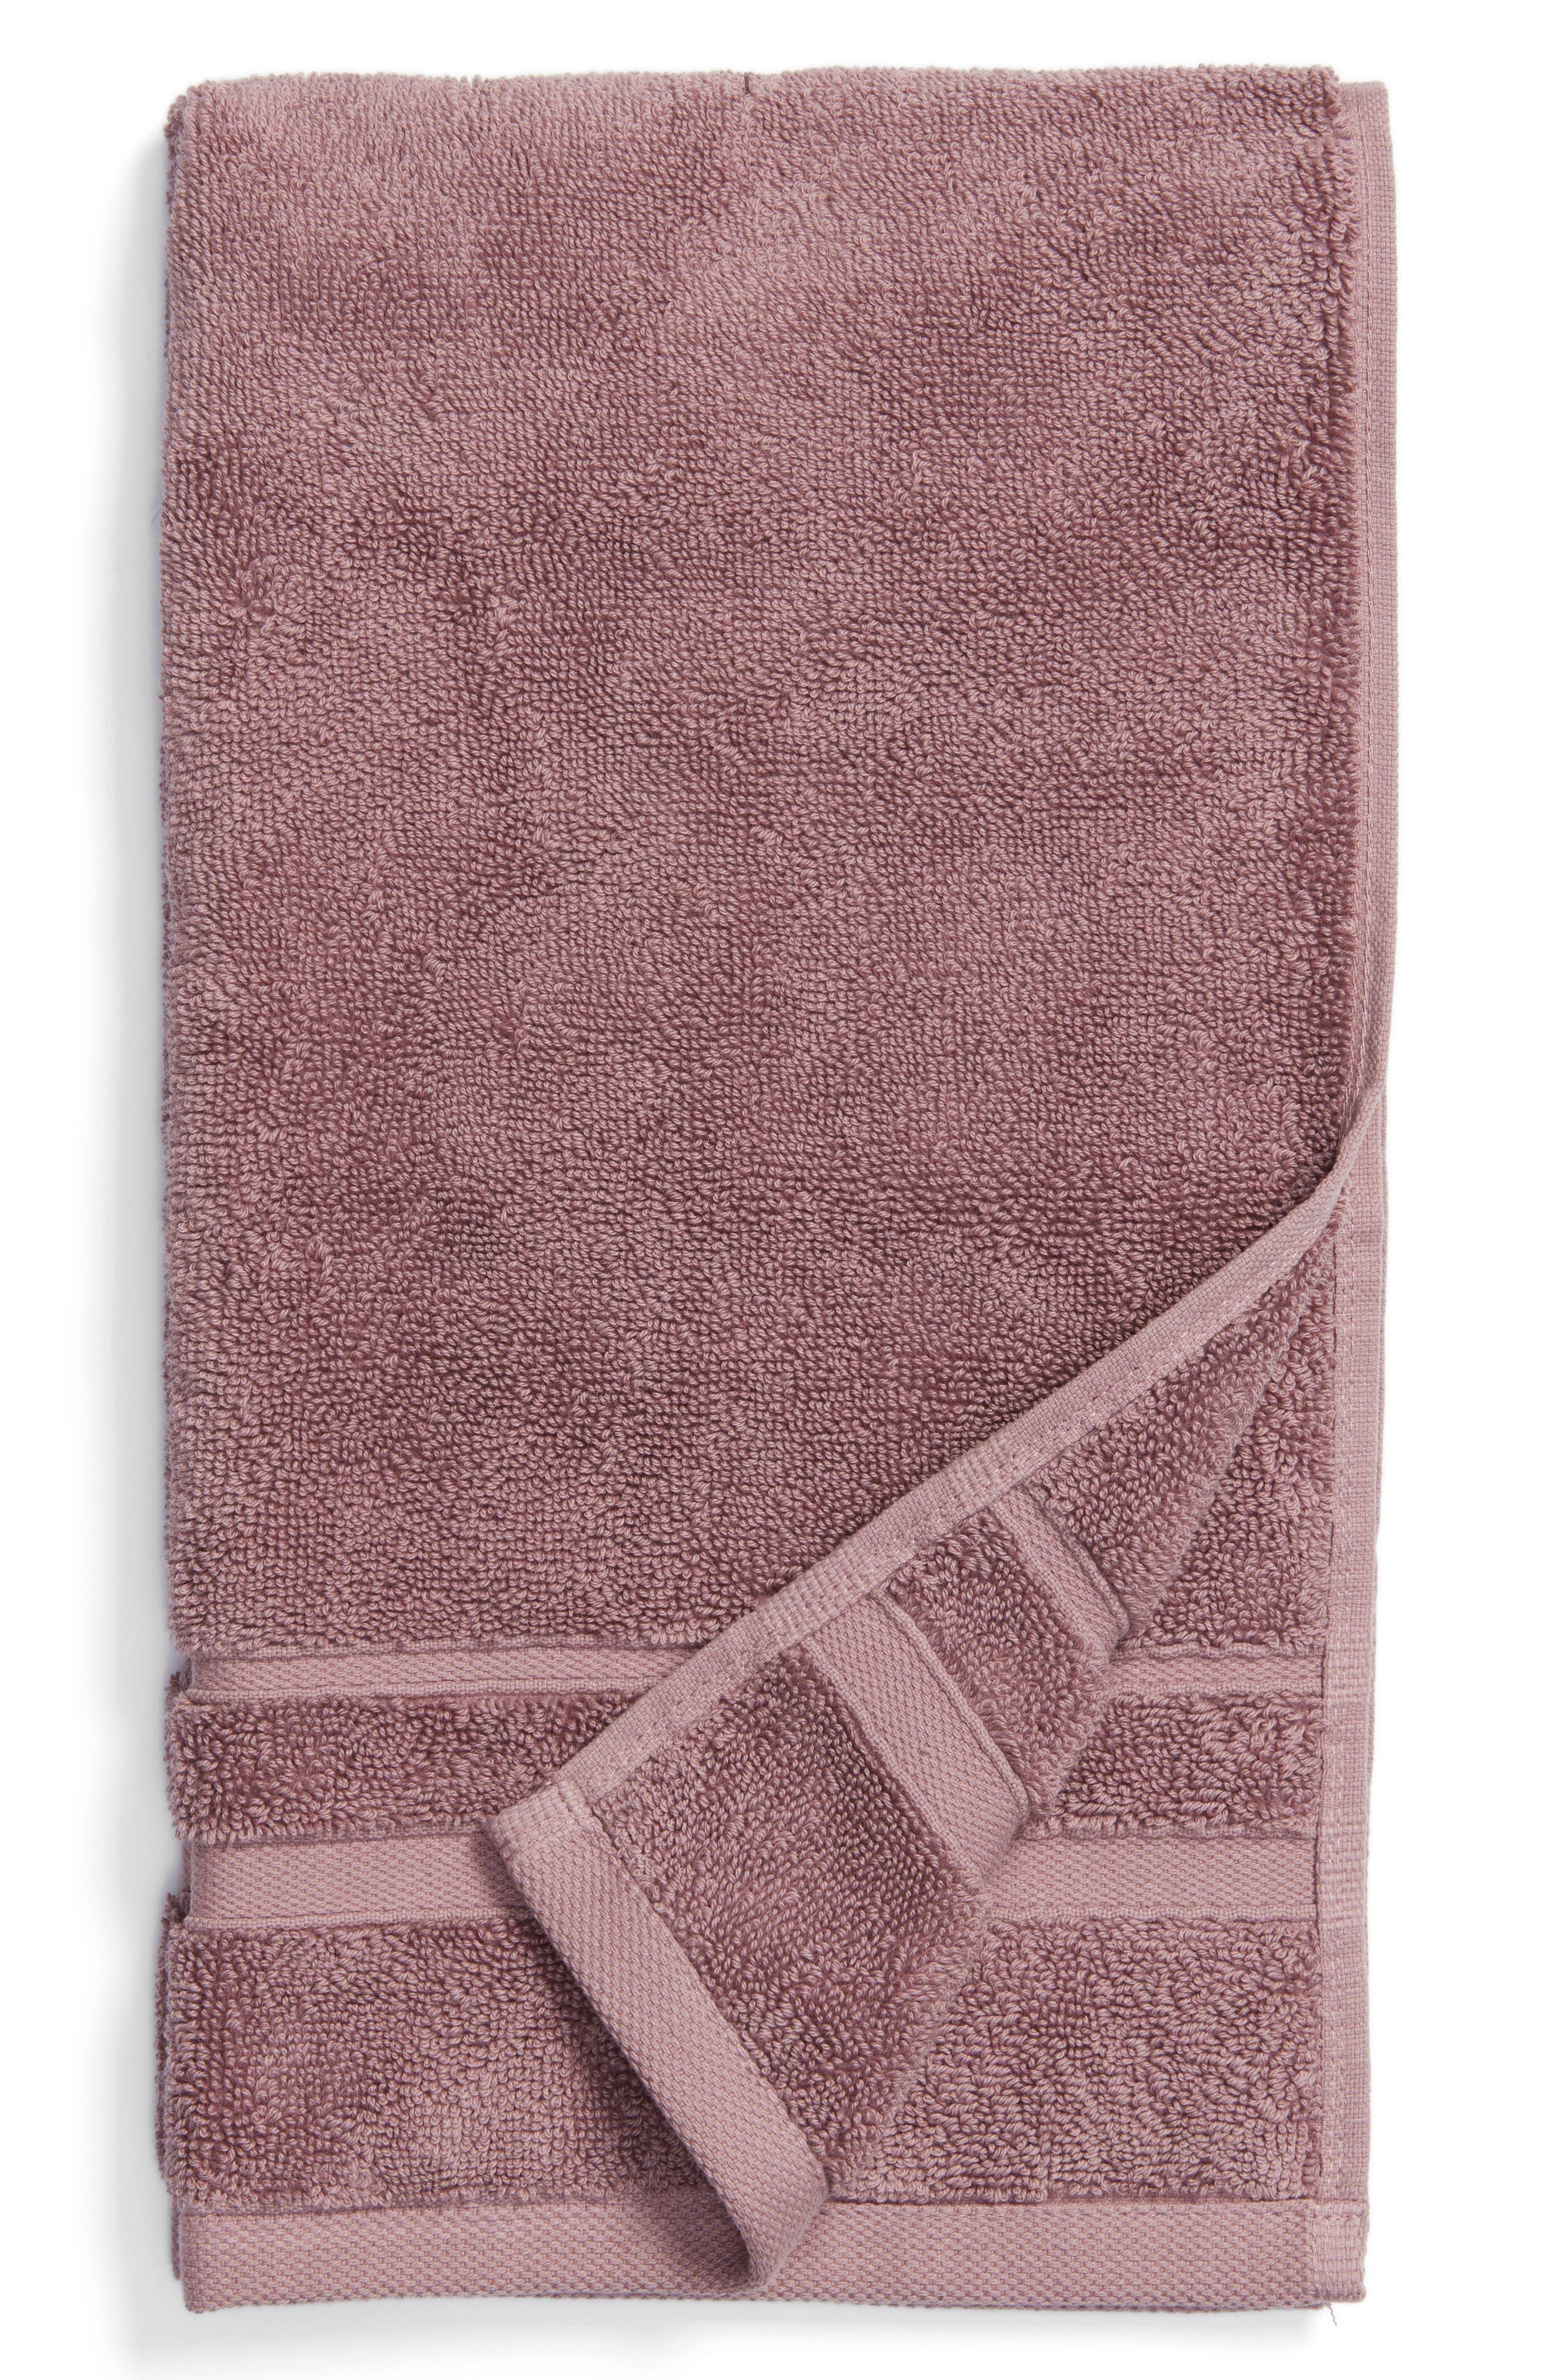 Studio 'Perennial' Combed Turkish Cotton Hand Towel,                             Main thumbnail 1, color,                             Mallow